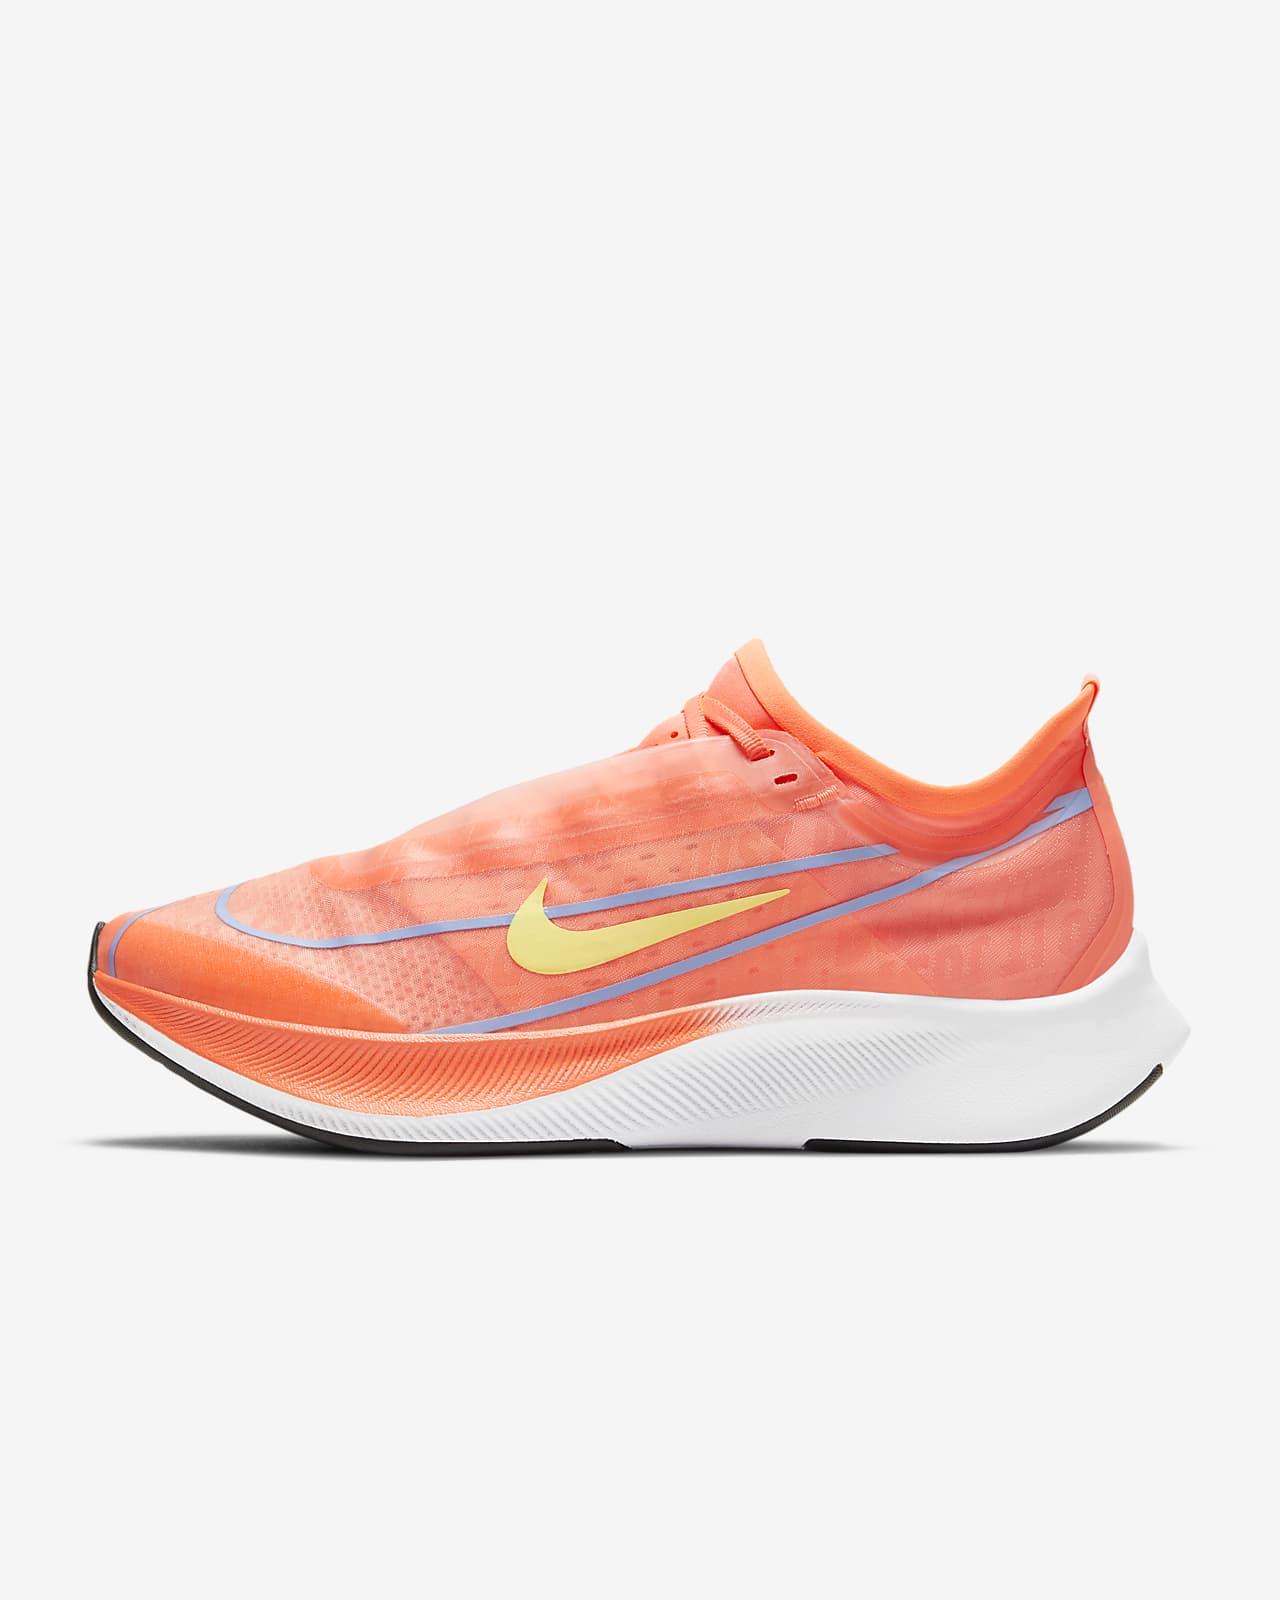 Calzado de running para carretera para mujer Nike Zoom Fly 3